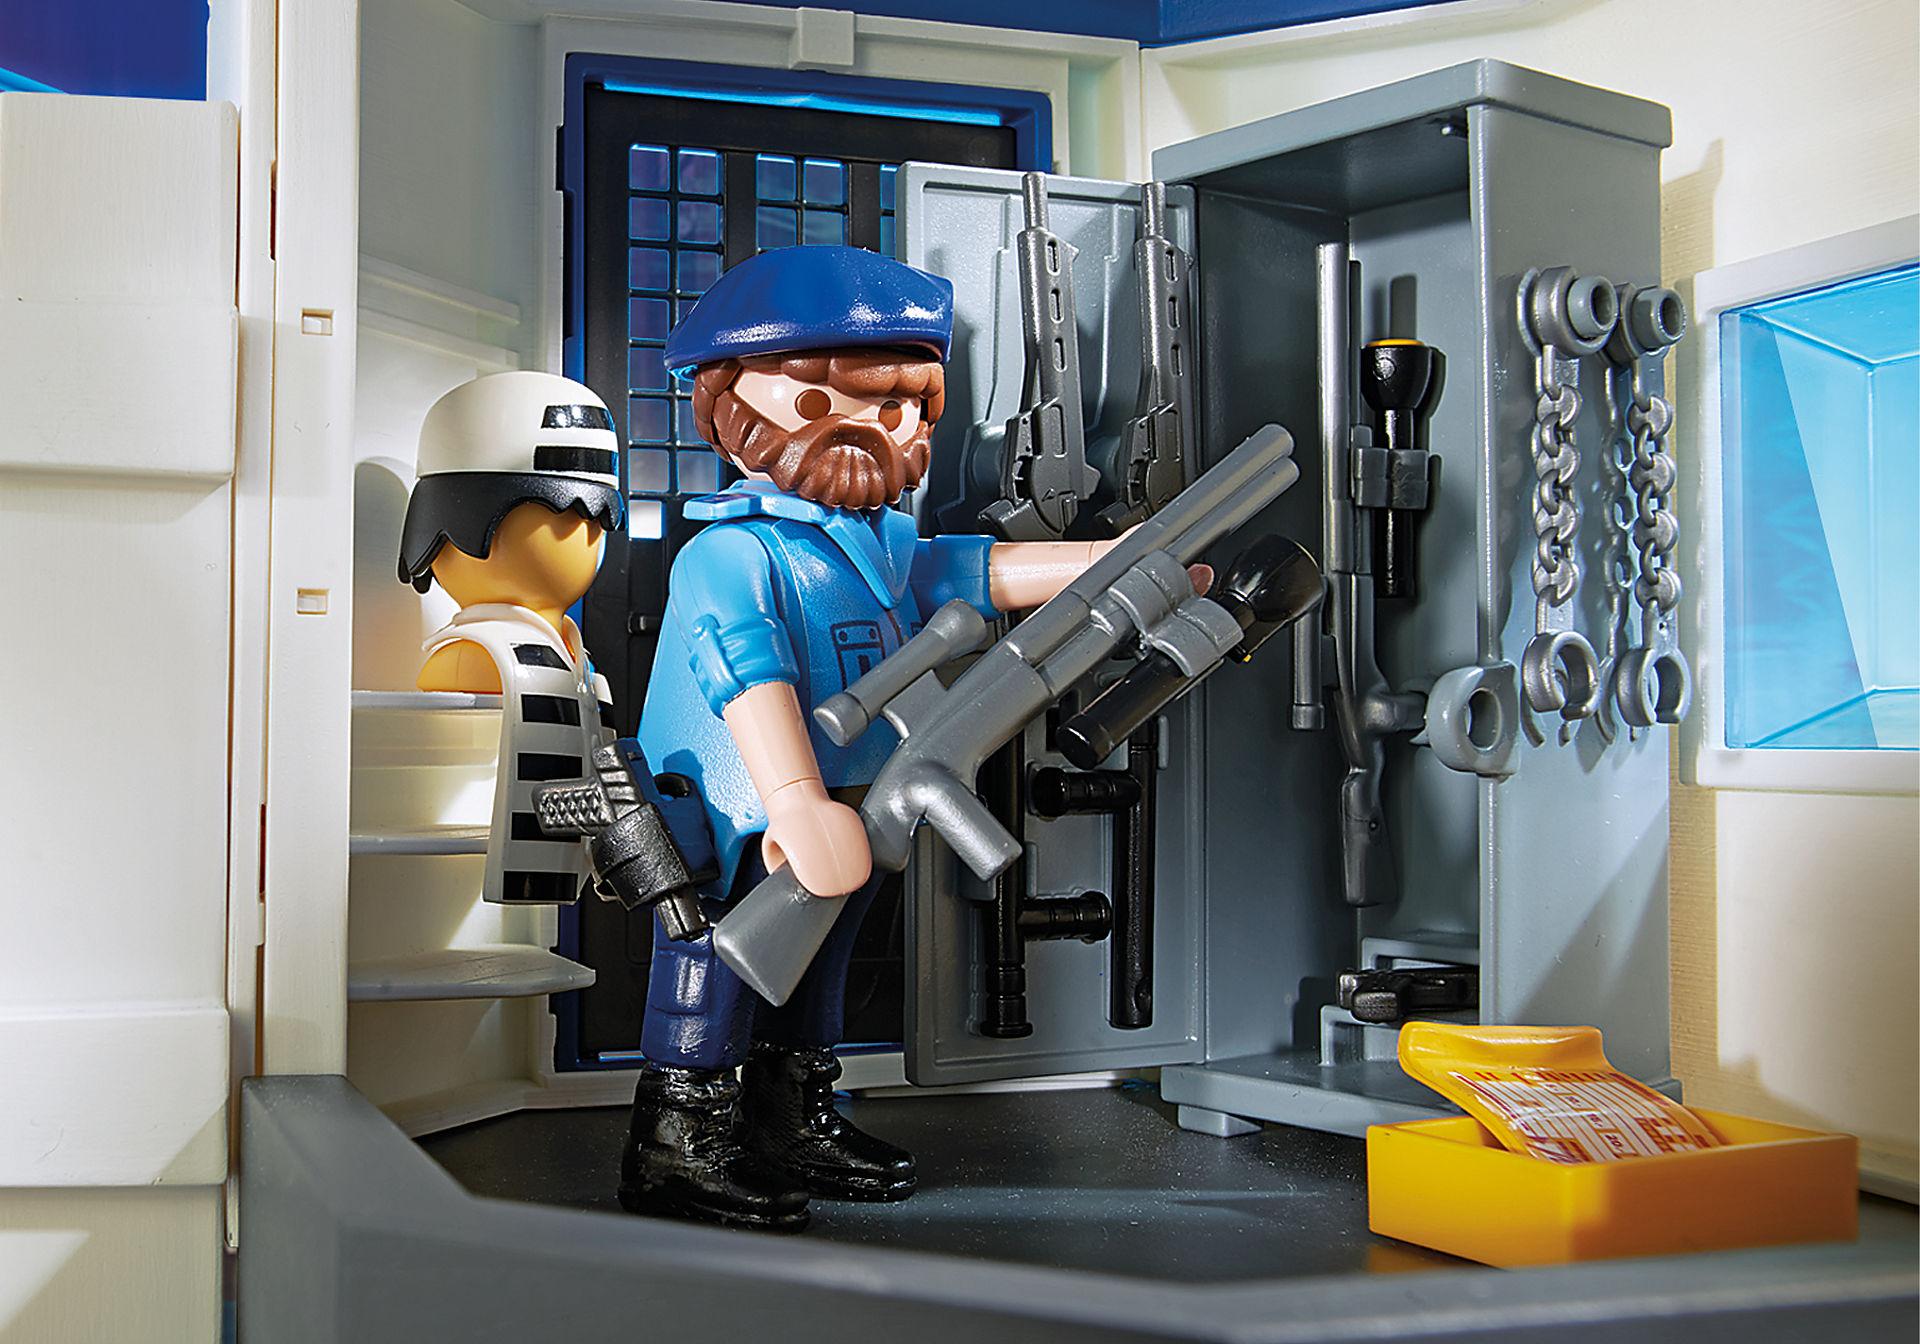 http://media.playmobil.com/i/playmobil/6872_product_extra5/Polizei-Kommandozentrale mit Gefängnis